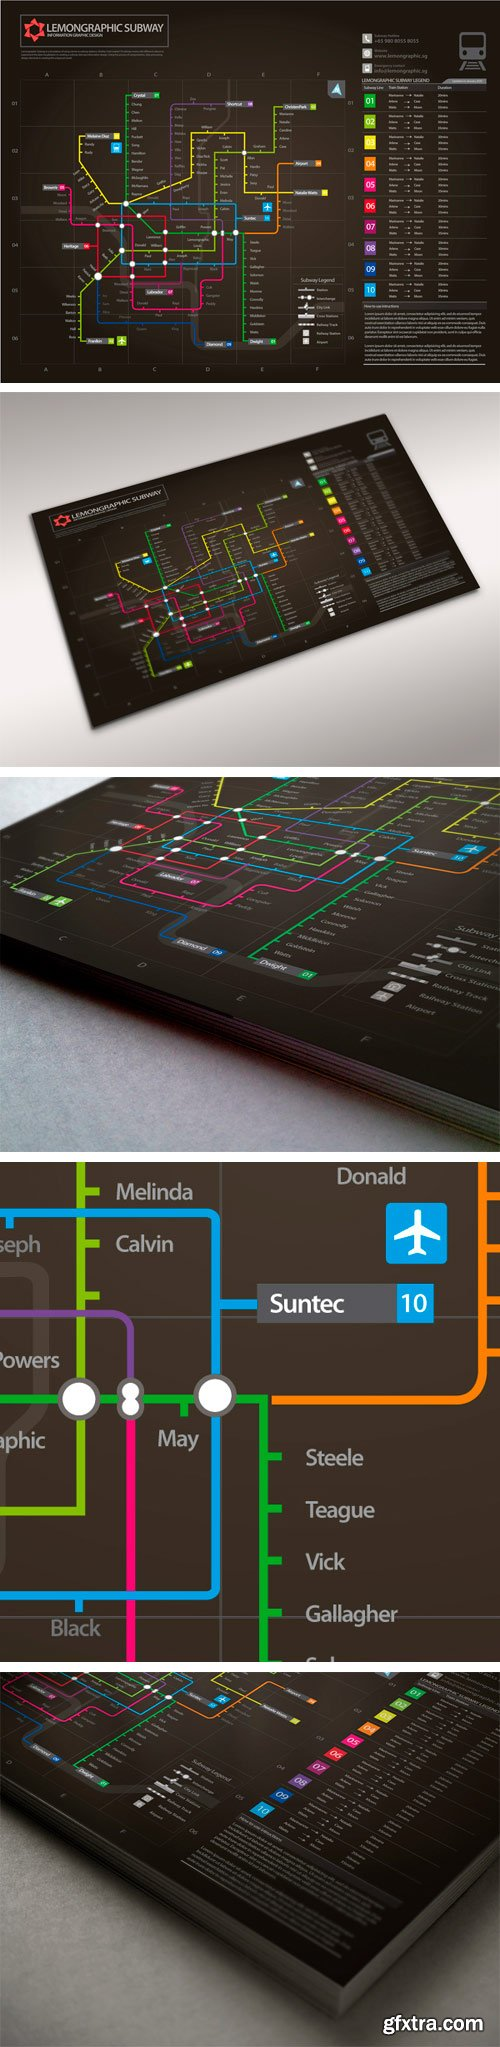 CM 143801 - Neon Subway Map Information Design